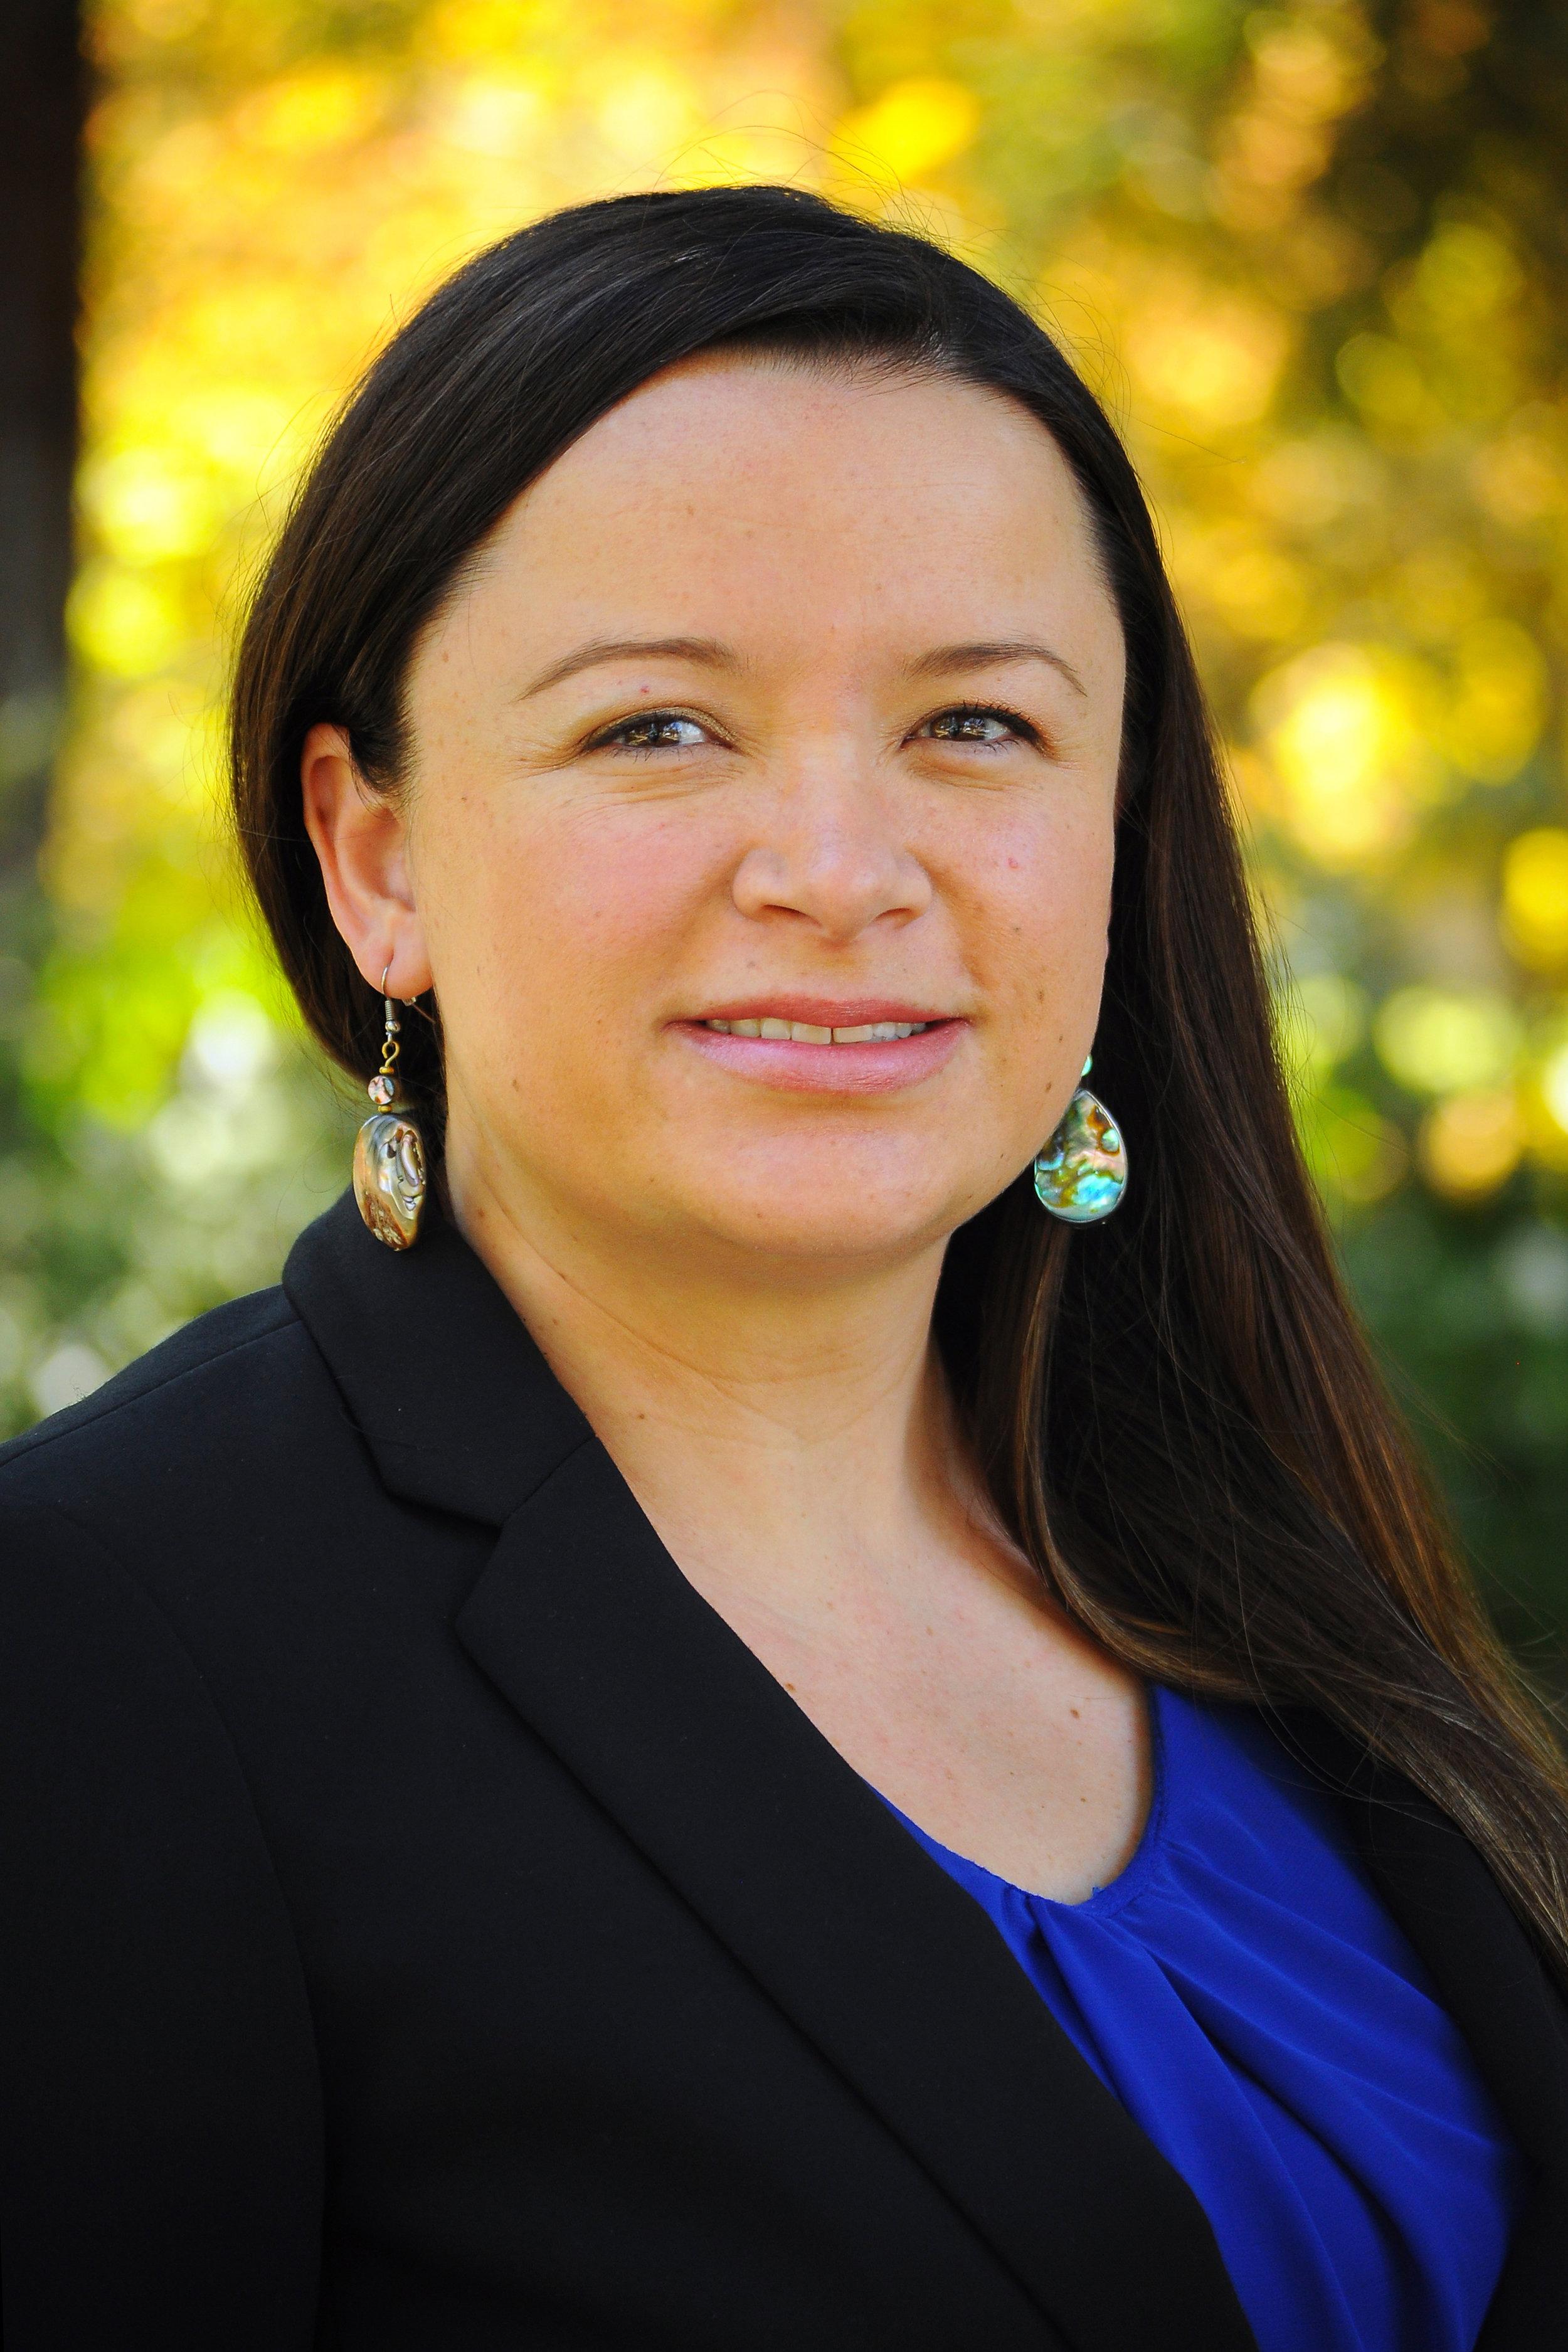 Jennifer Ruiz,Chair Woman - Walk your talk!